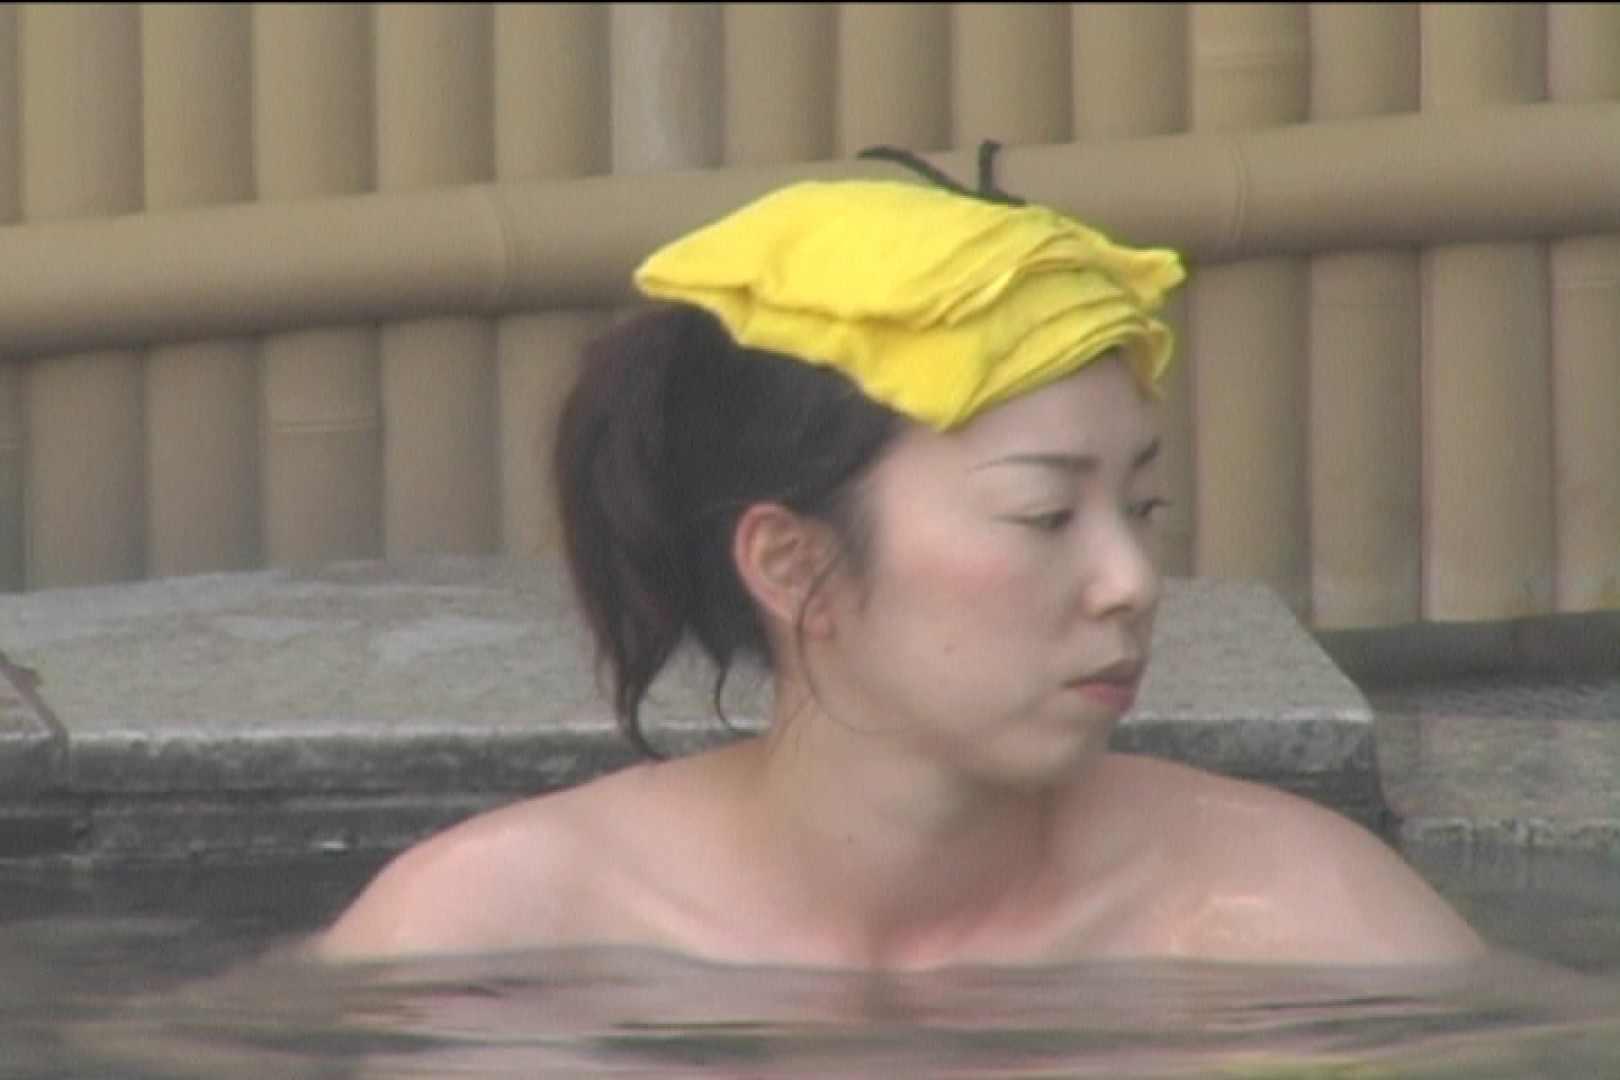 Aquaな露天風呂Vol.529 盗撮シリーズ | 露天風呂編  106PIX 87